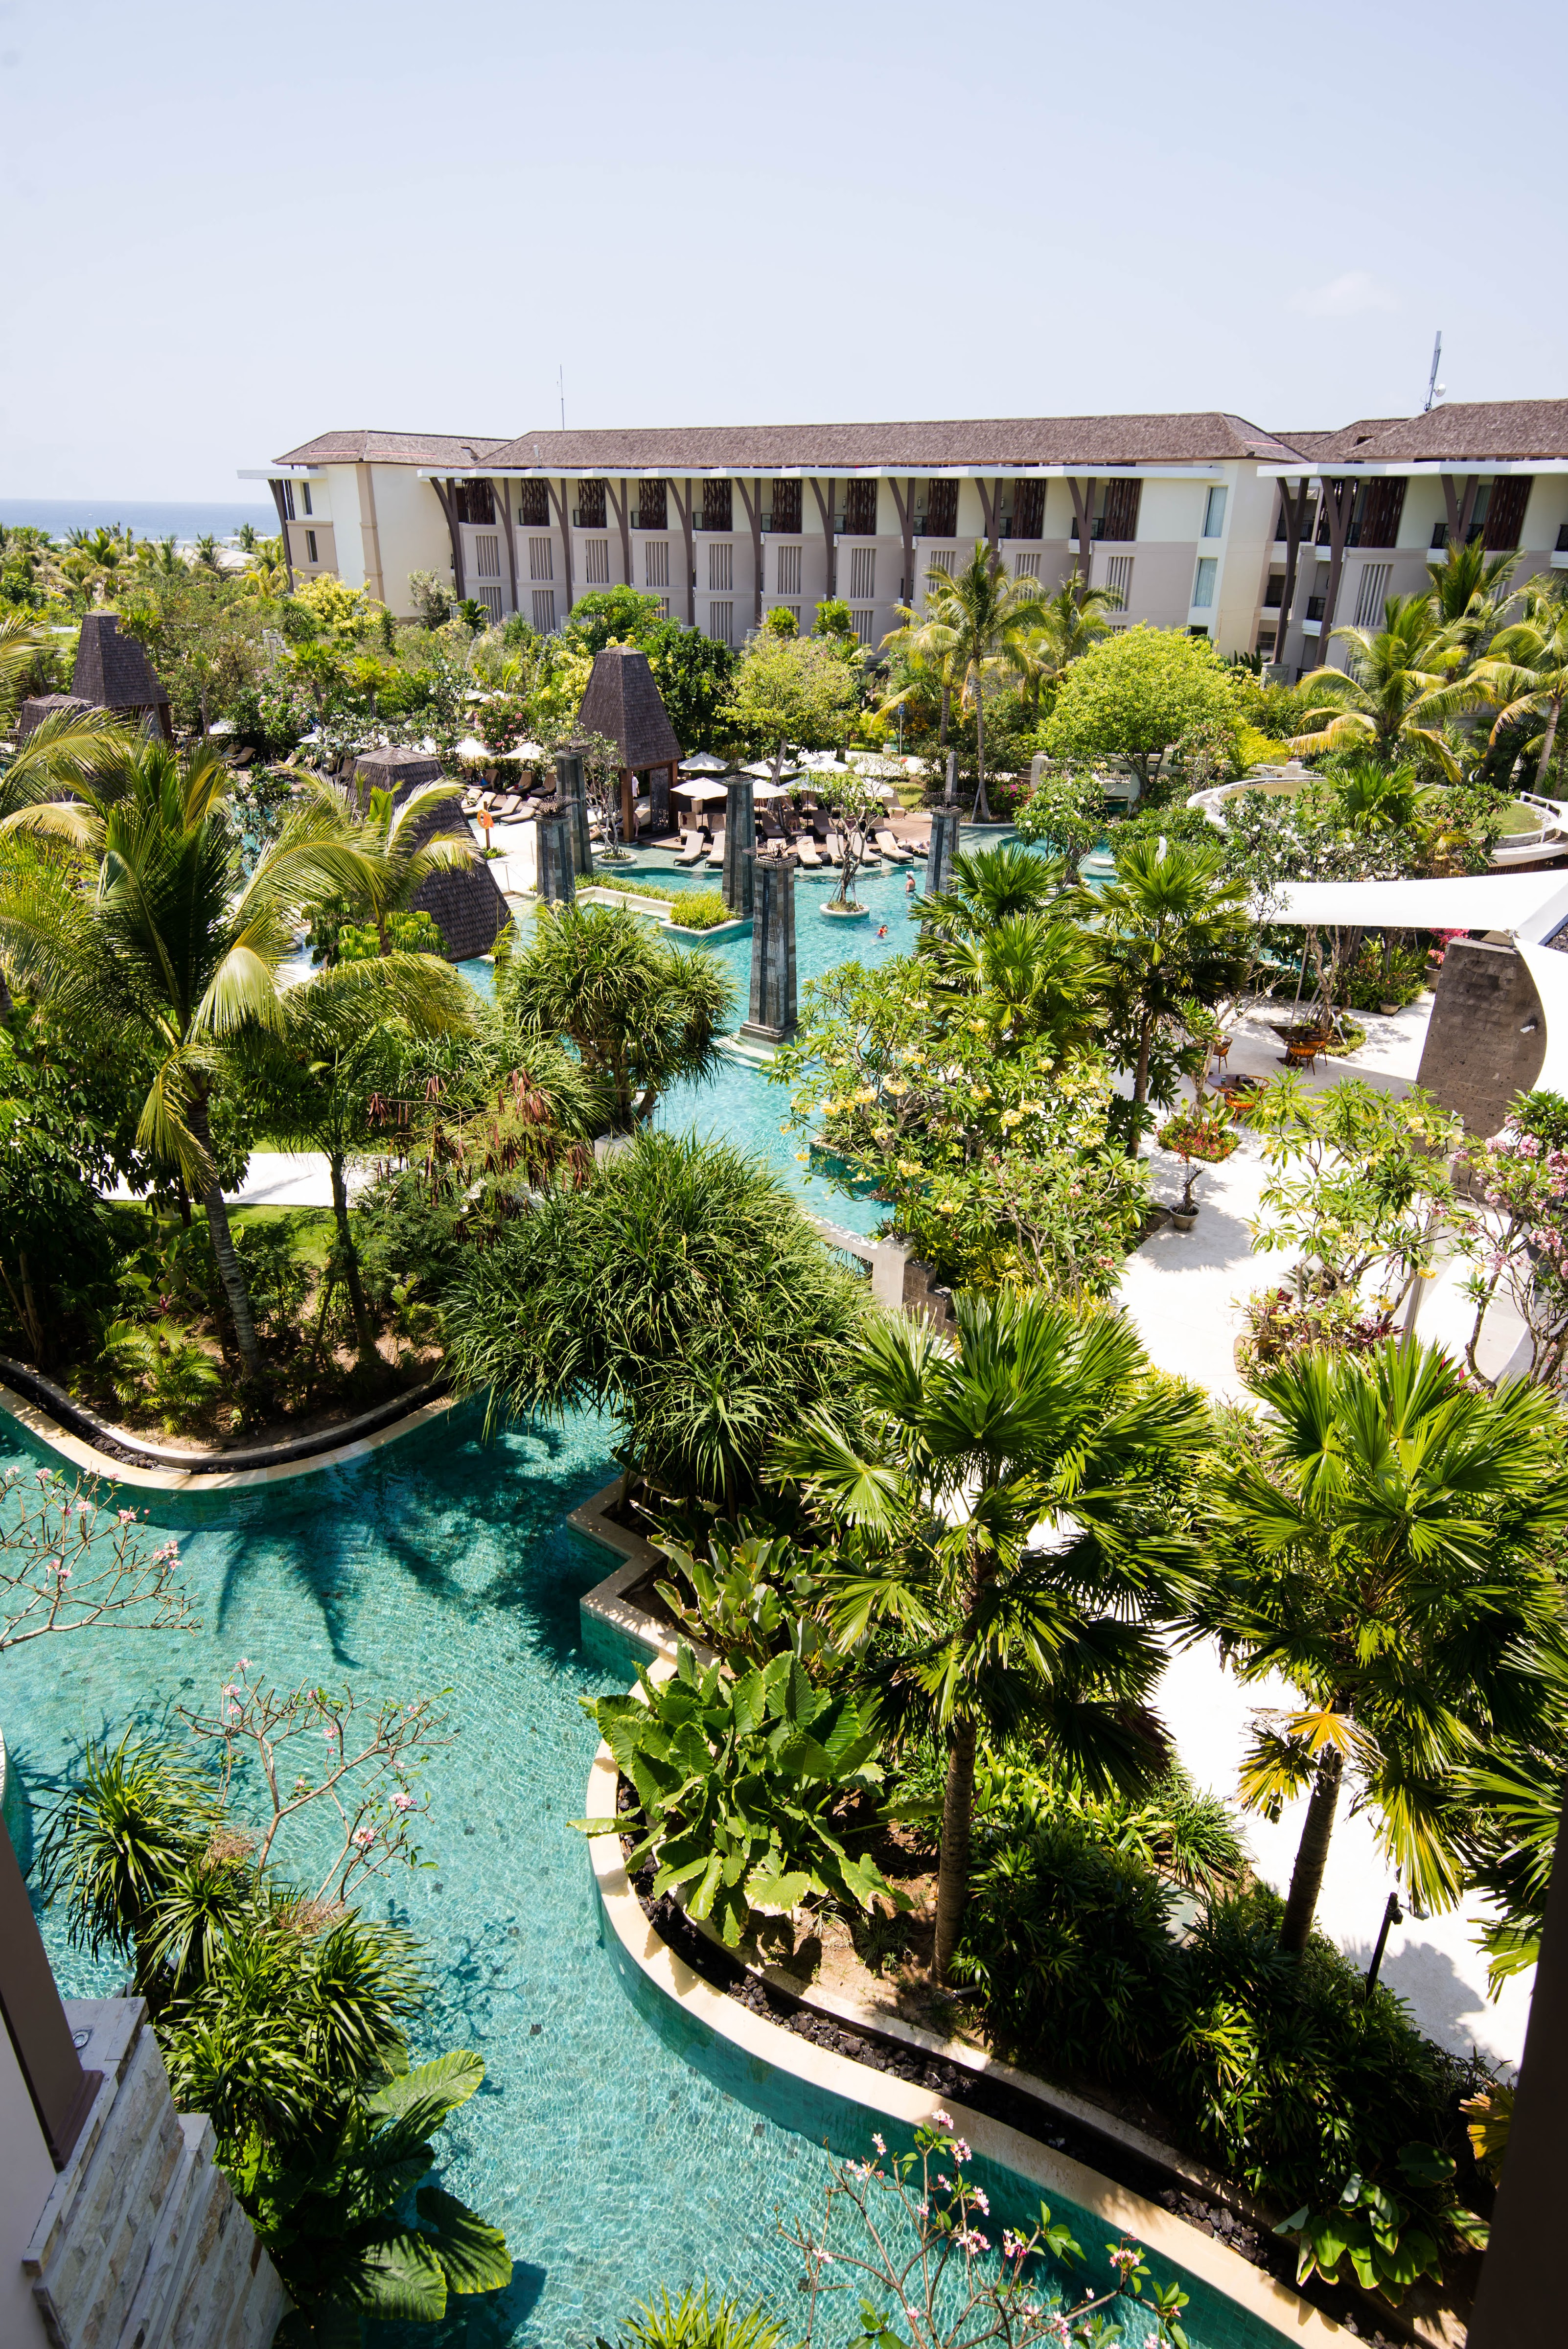 Bali Beach Hotel: Sofitel | Gina Chong